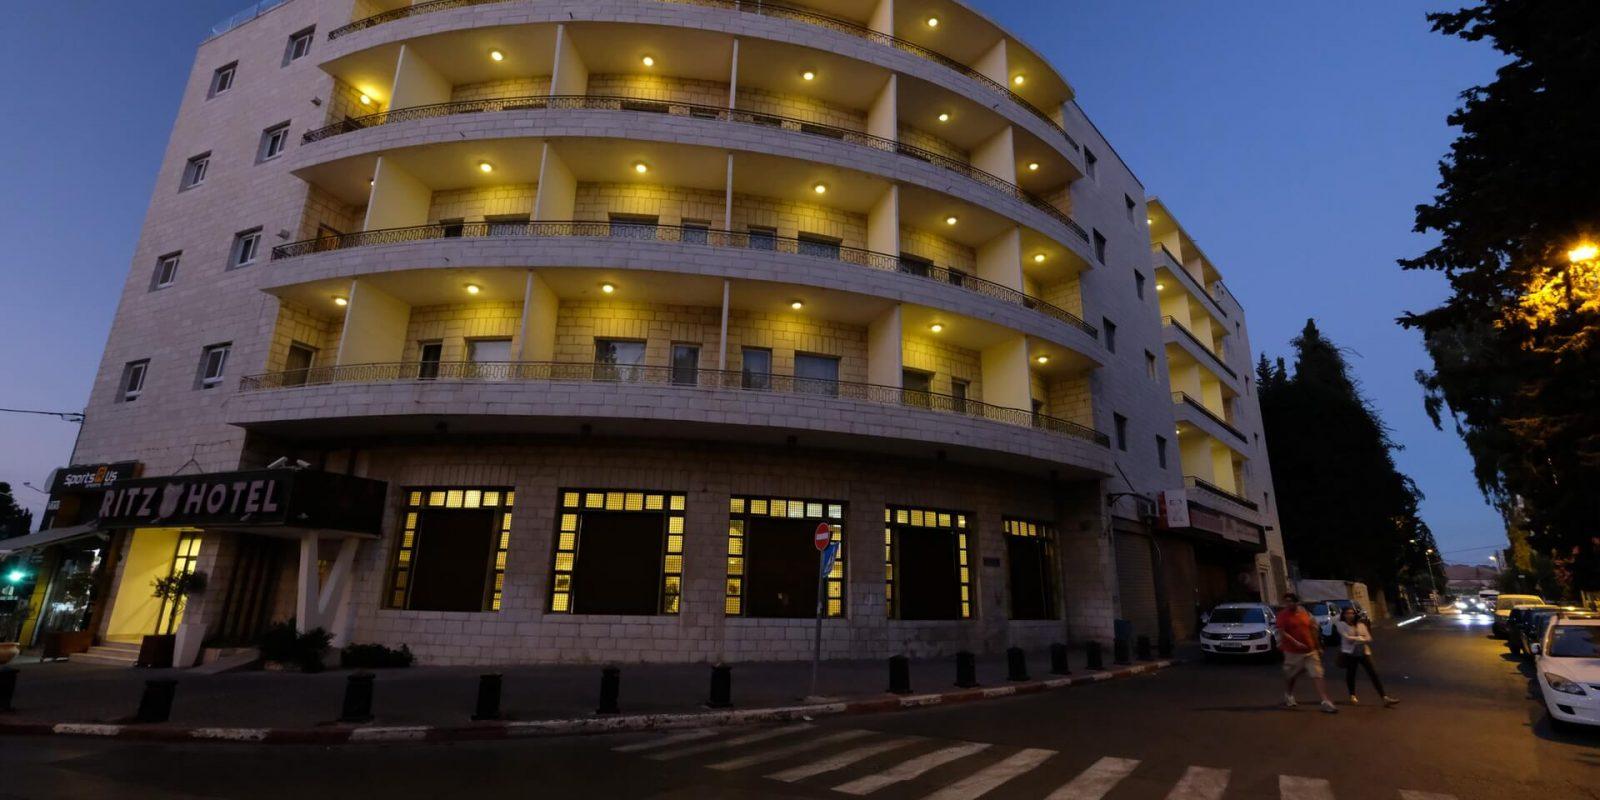 Ritz hotel_public area (1)